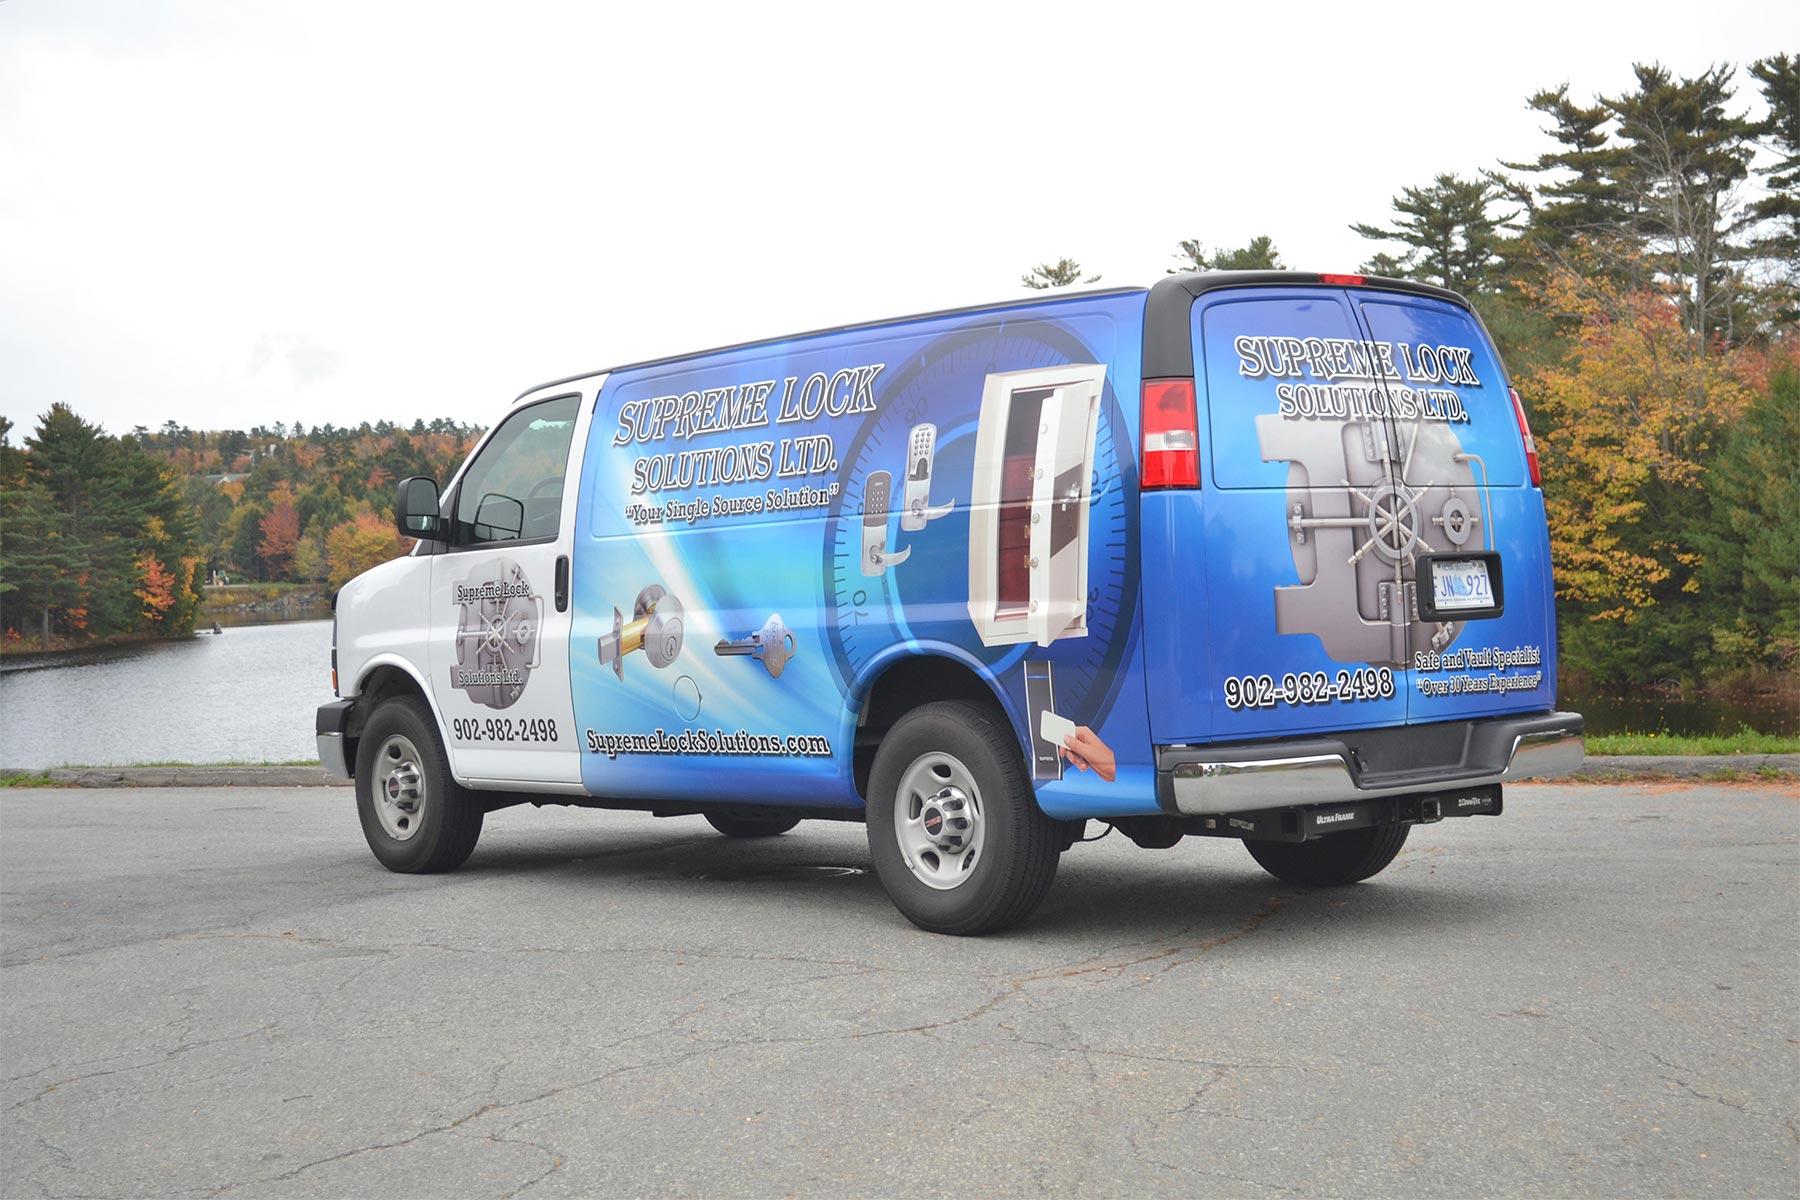 Supreme Lock Solutions Van